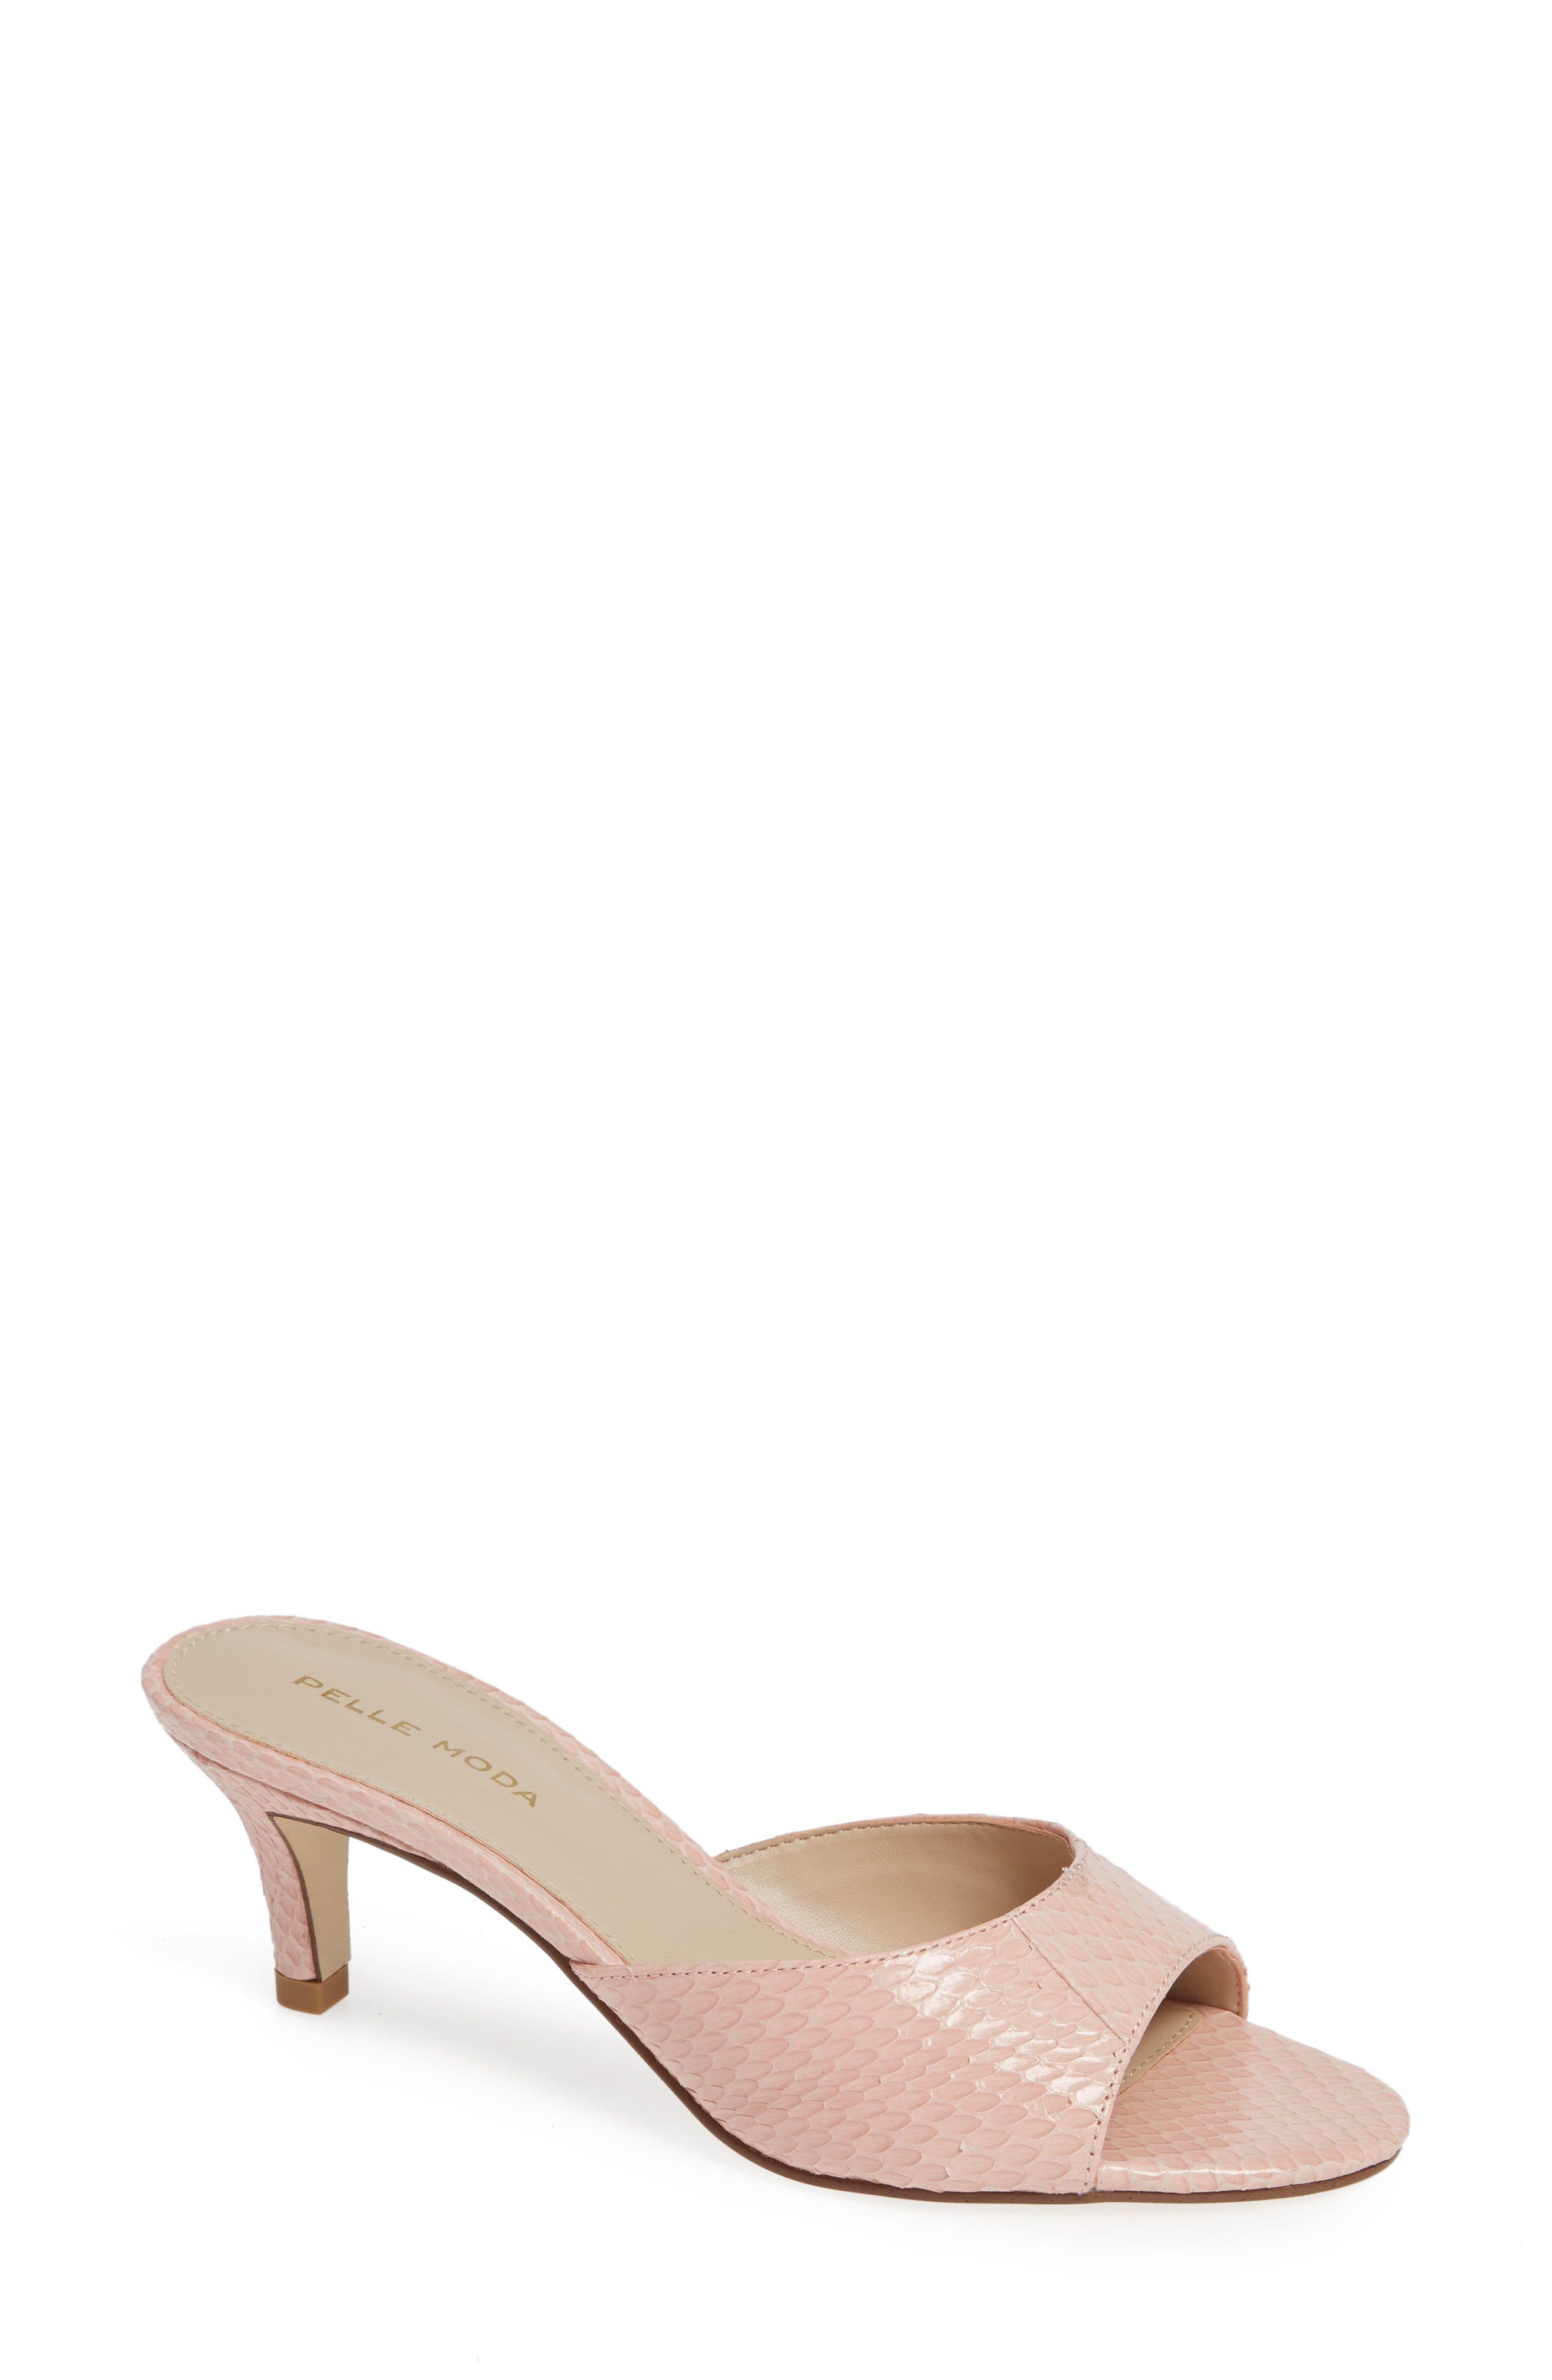 Women S Pelle Moda Bex Kitten Heel Slide Sandal Size 9 M Beige Kitten Heels Heels Slide Sandals